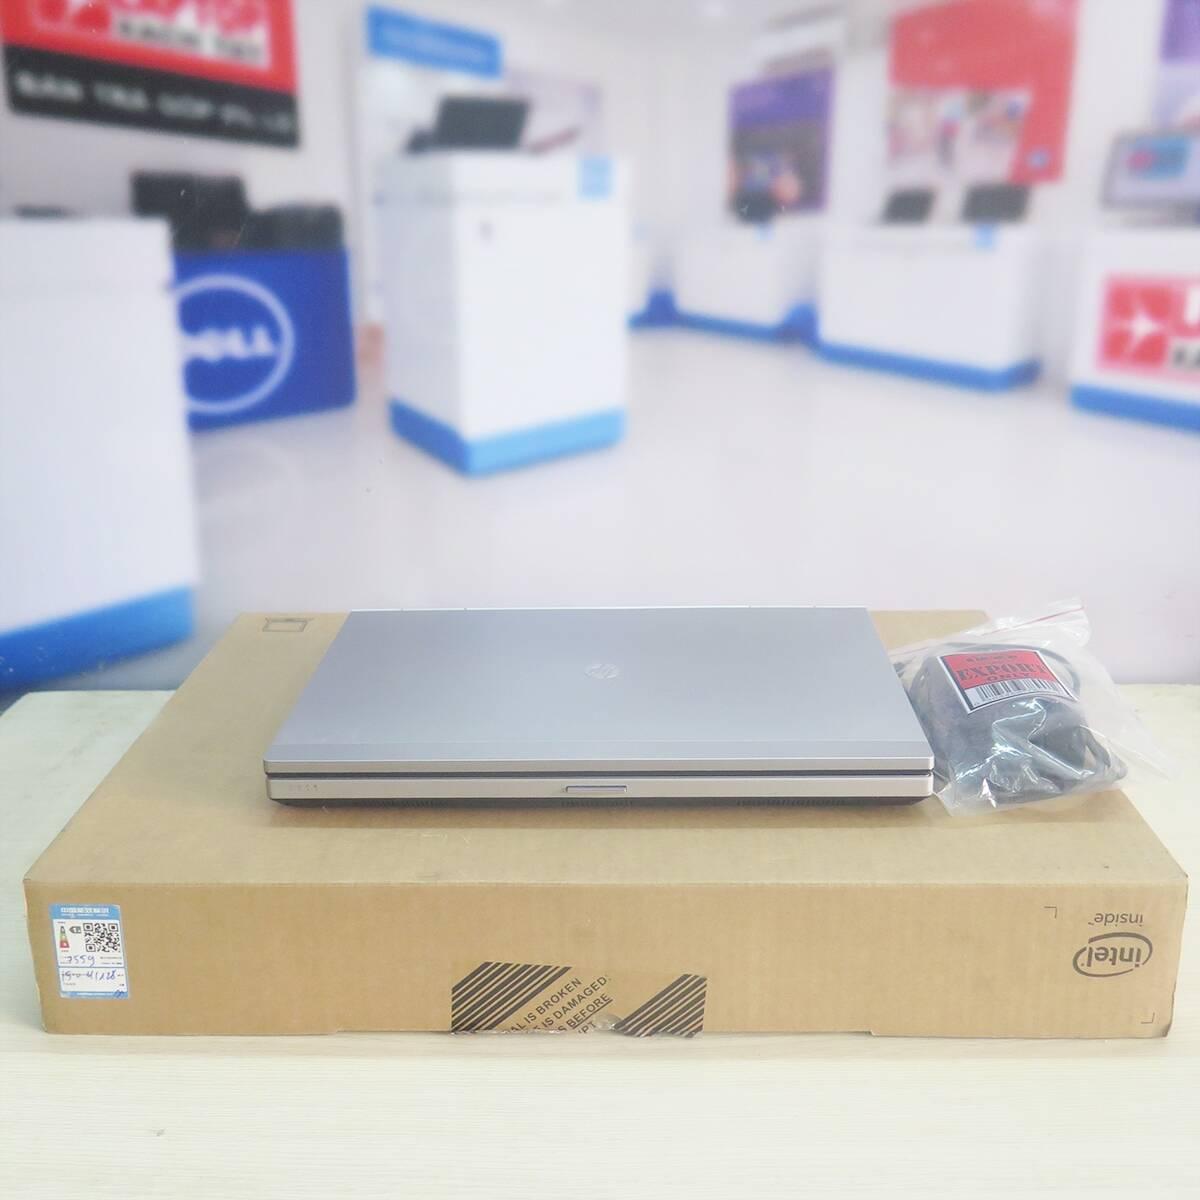 HP ELITEBOOK 8470P I5 3320M Ram 4Gb HDD 250Gb